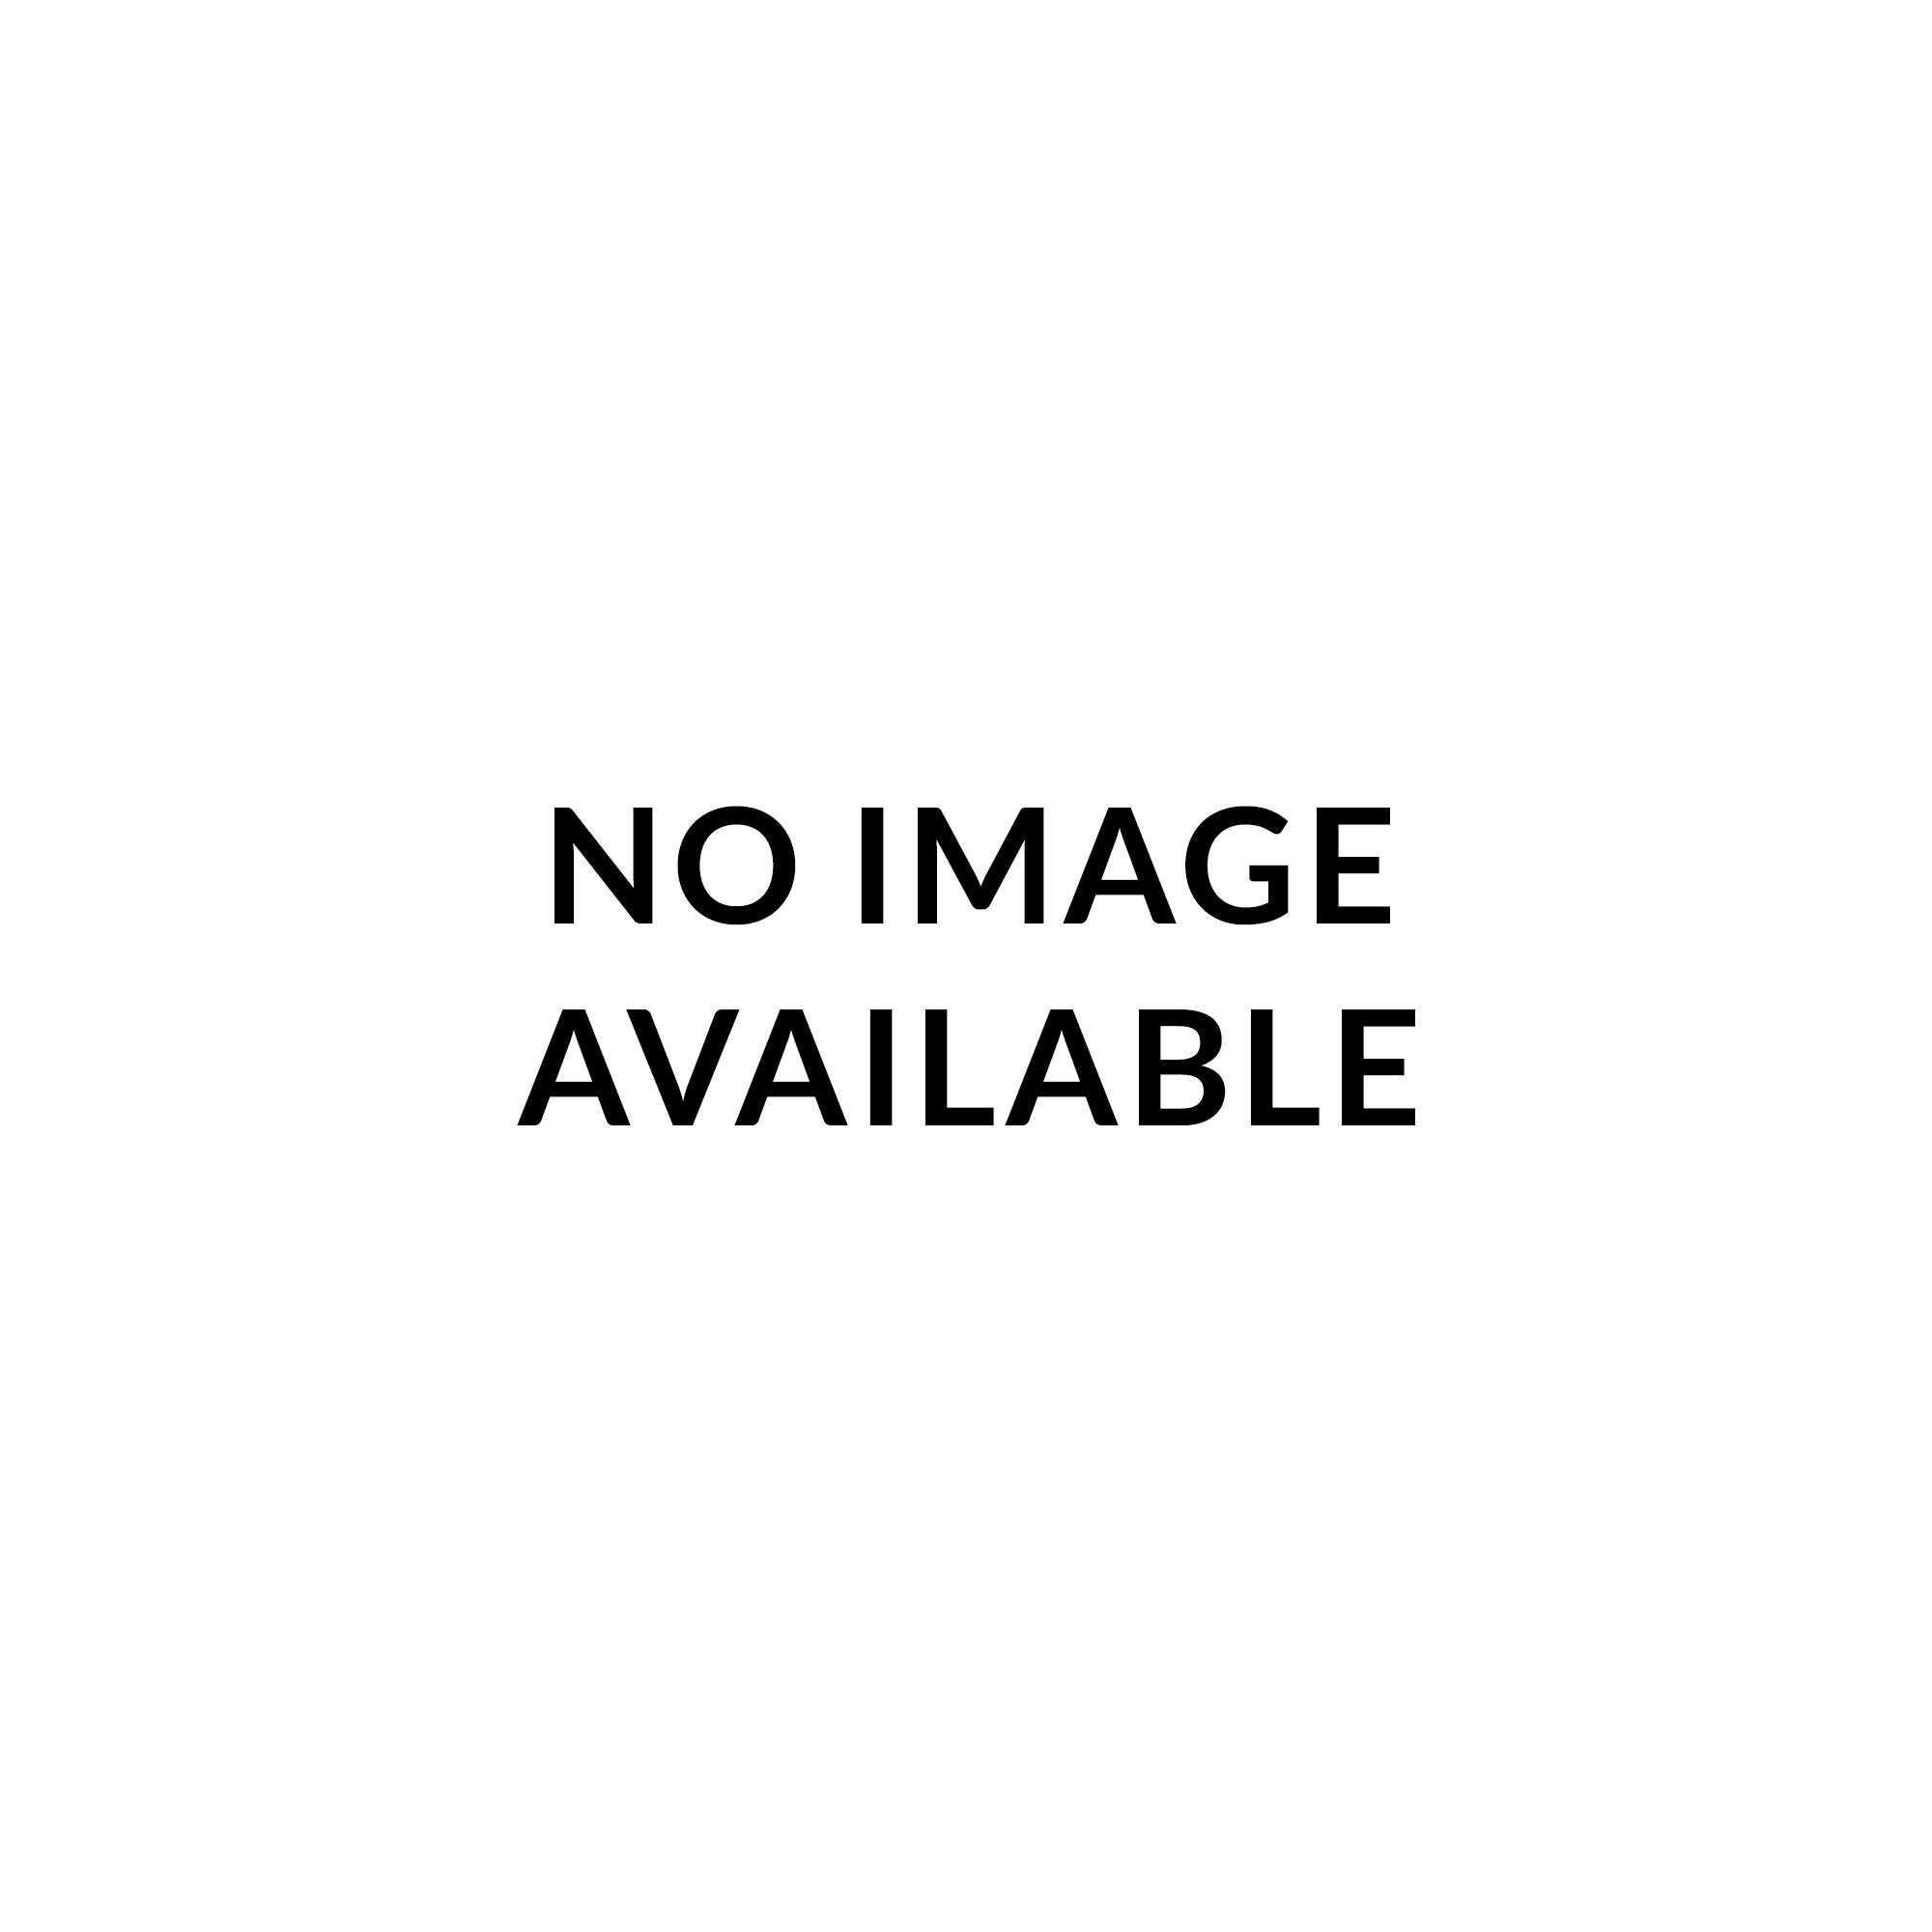 D'Addario PSB125 ProSteels XL Bass Single String .125 Long Scale